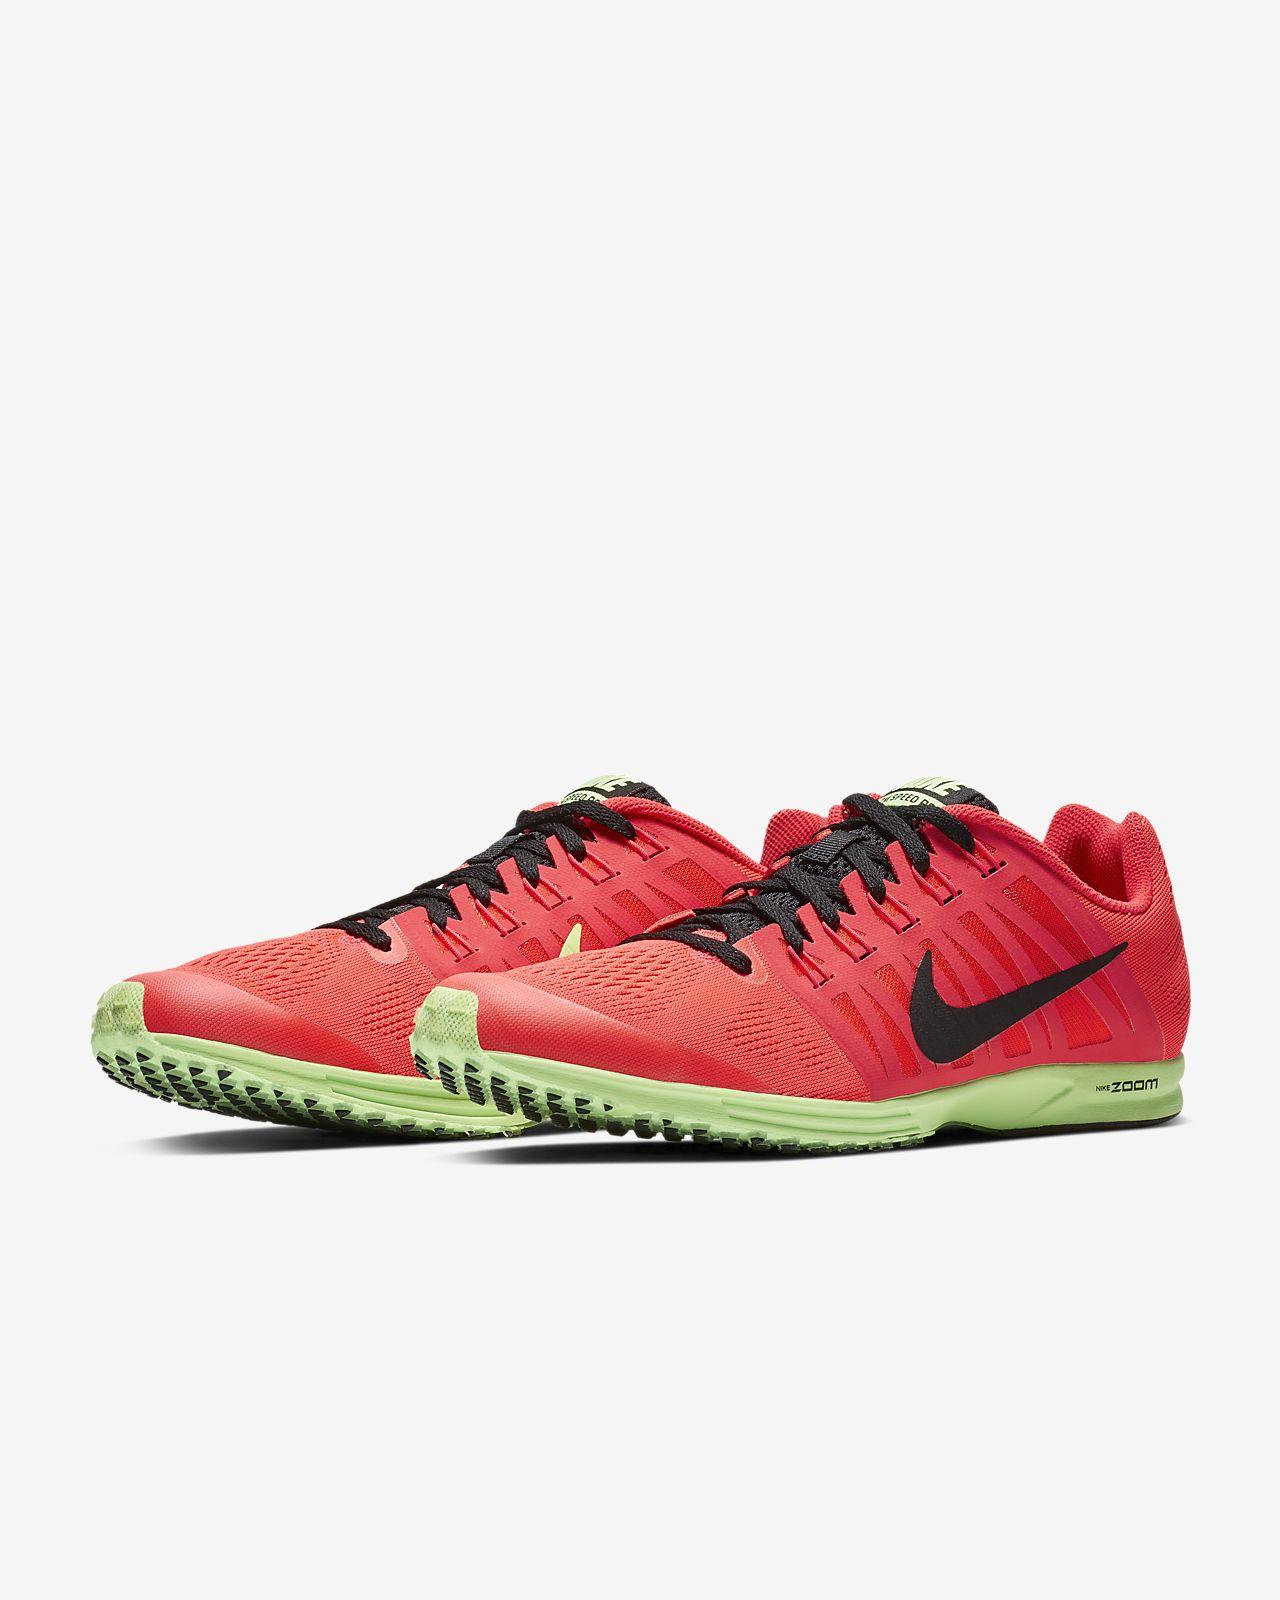 c51efdb9e9c8 Nike Air Zoom Speed Racer 6 Running Shoe. Nike.com